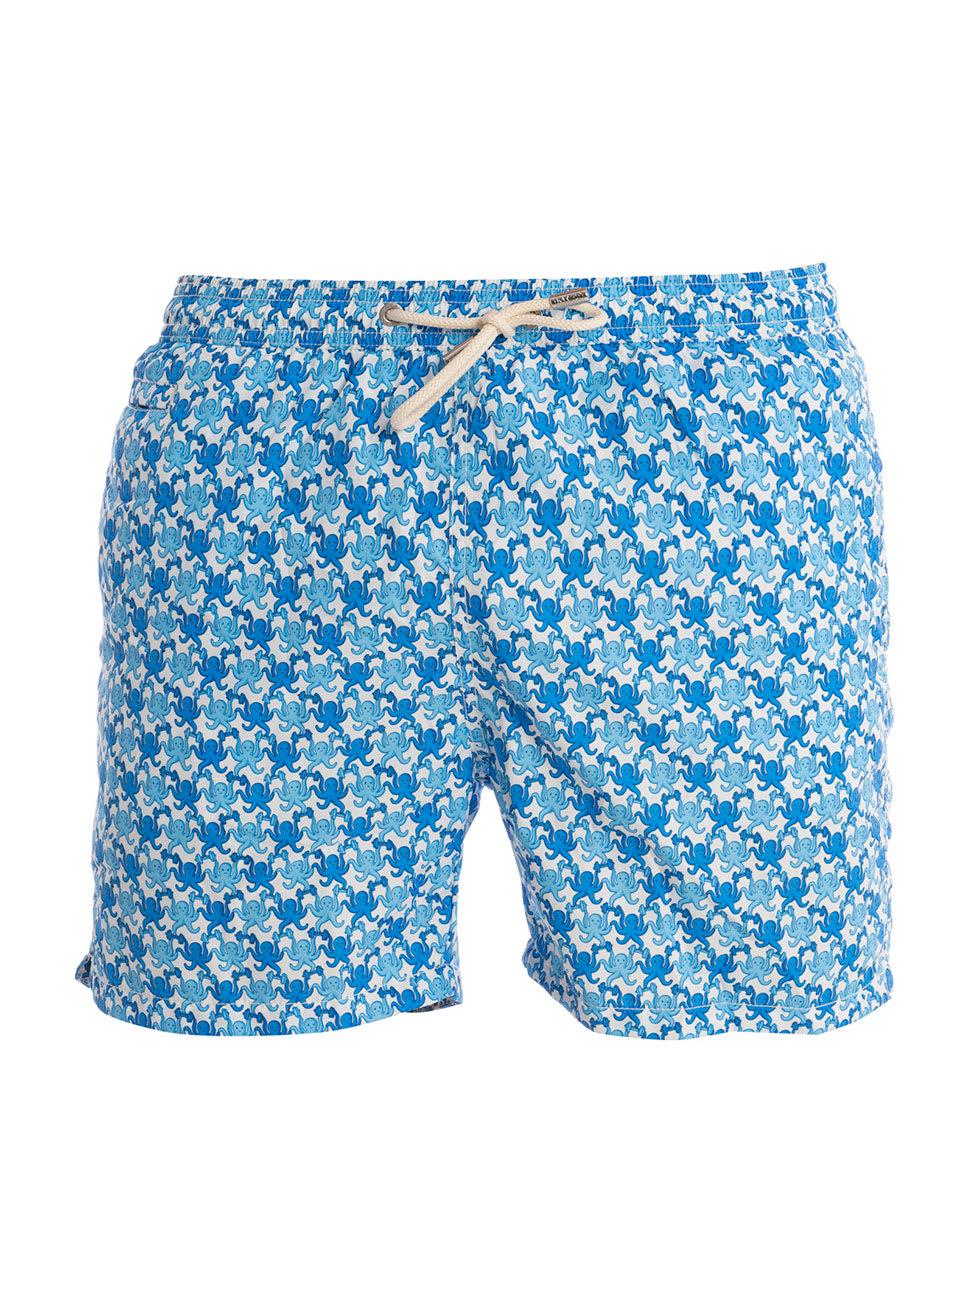 MC2 Saint Barth Lighting Micro Swim Shorts